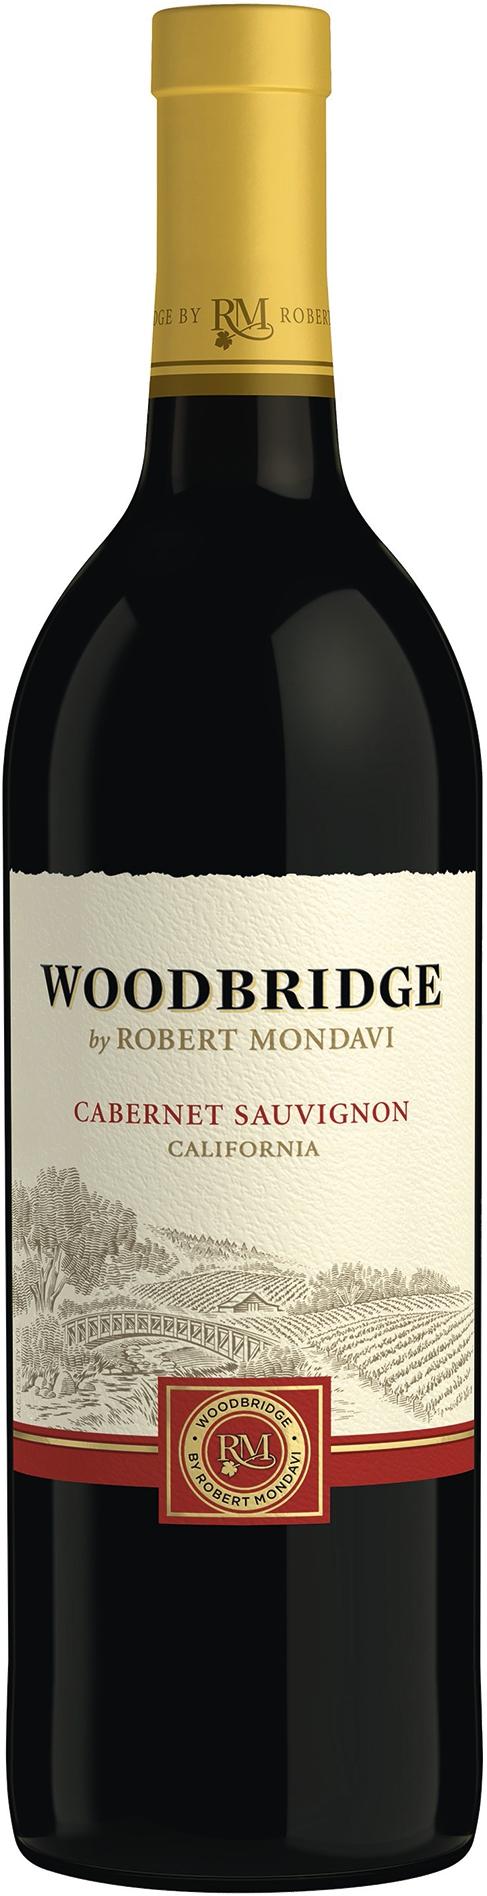 Produktbild på Woodbridge by Robert Mondavi